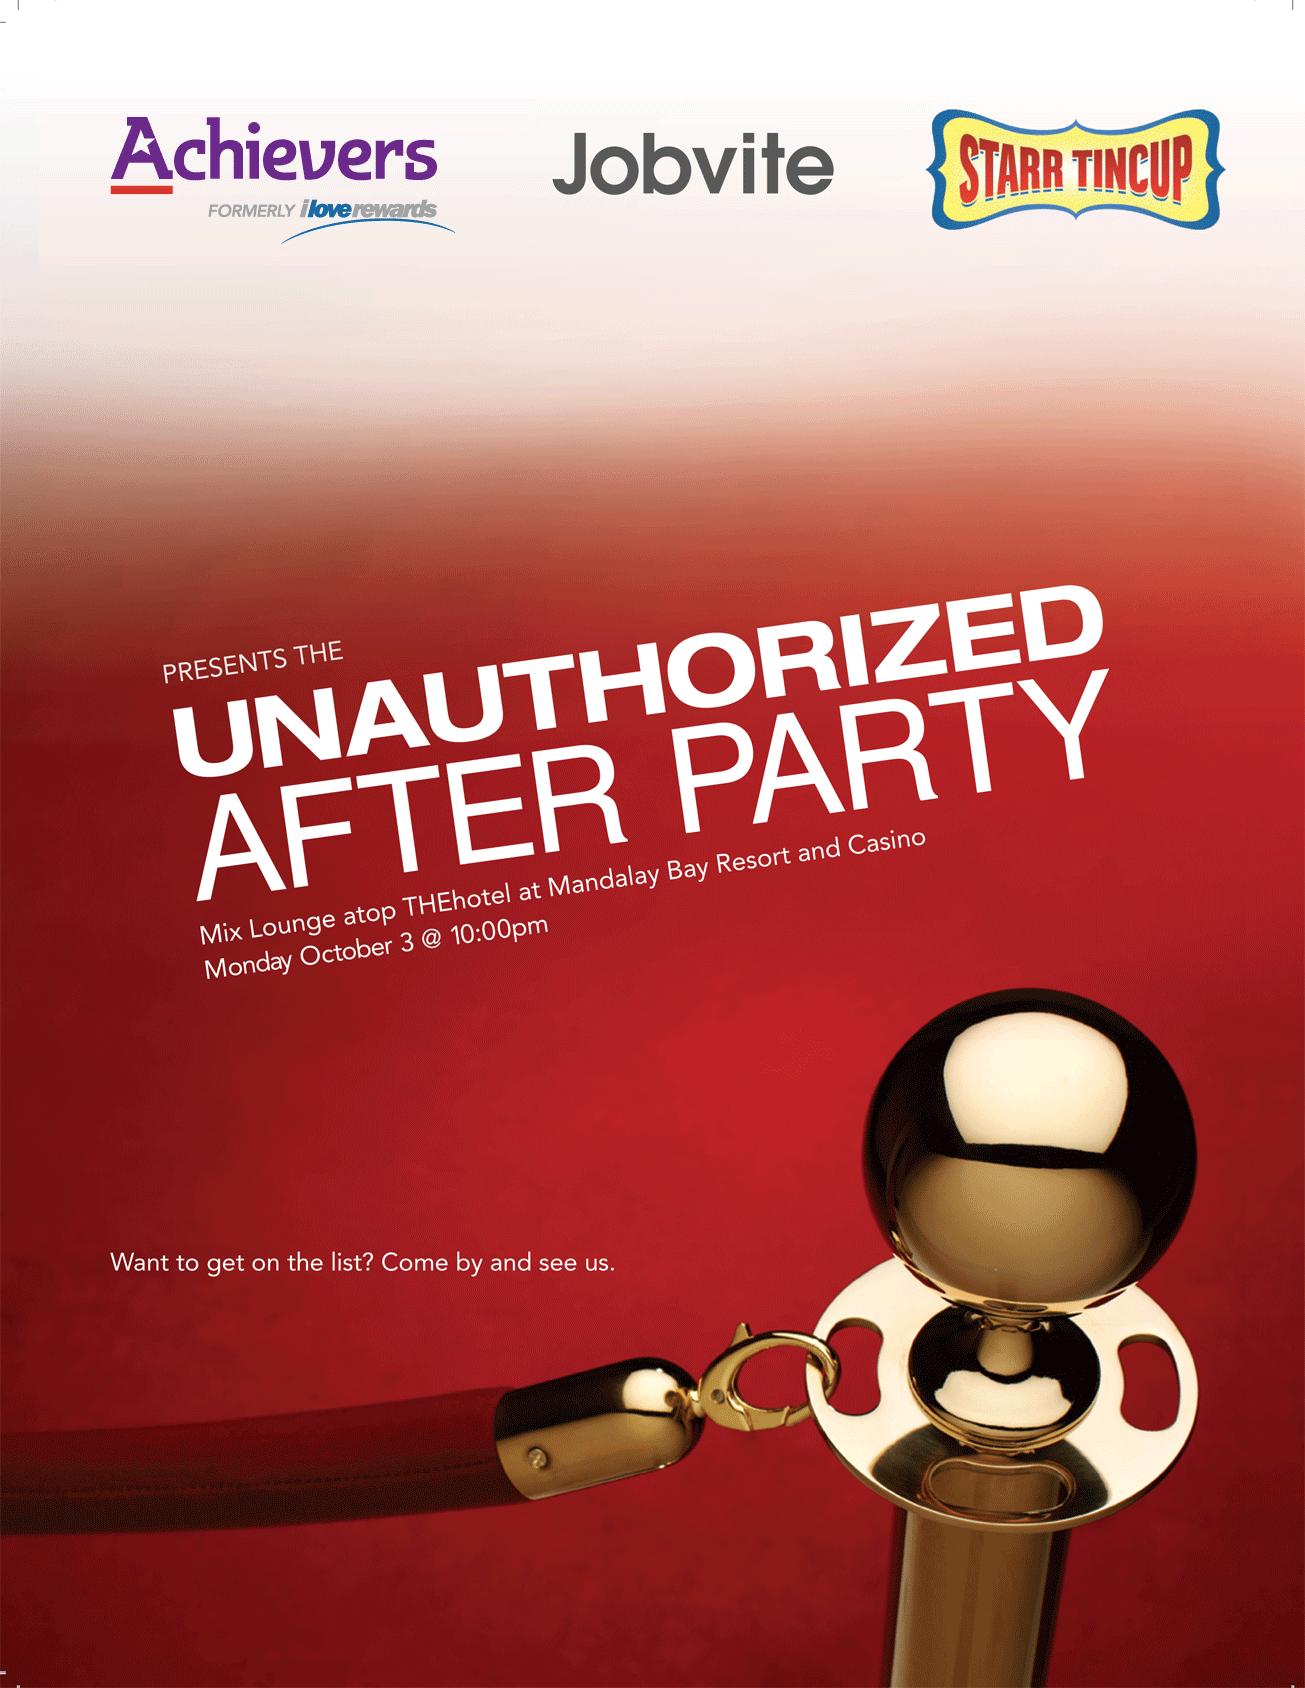 unauthorixed Party invite